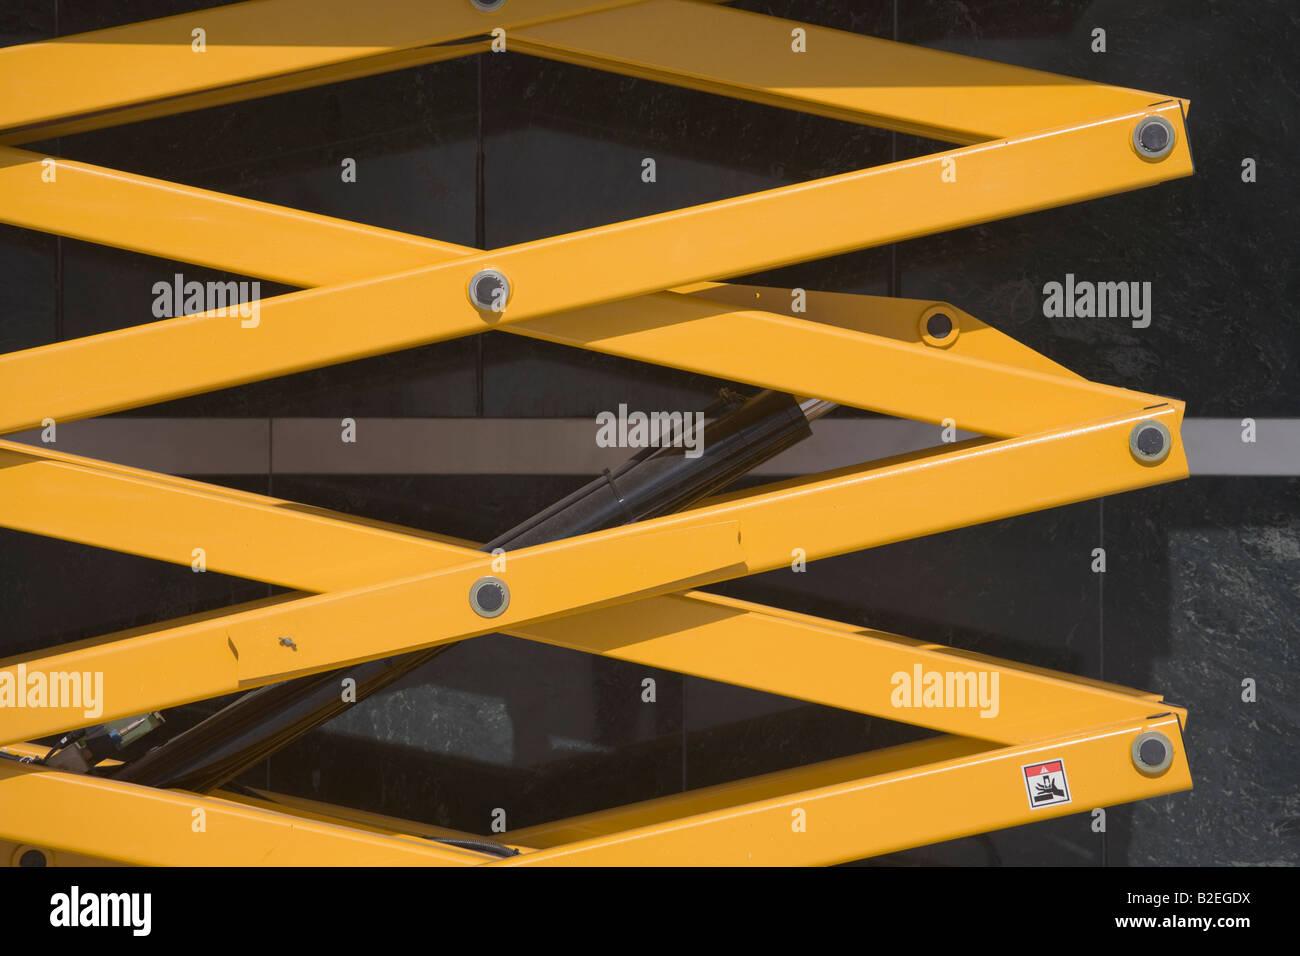 Scissor Lift Stock Photos & Scissor Lift Stock Images - Alamy